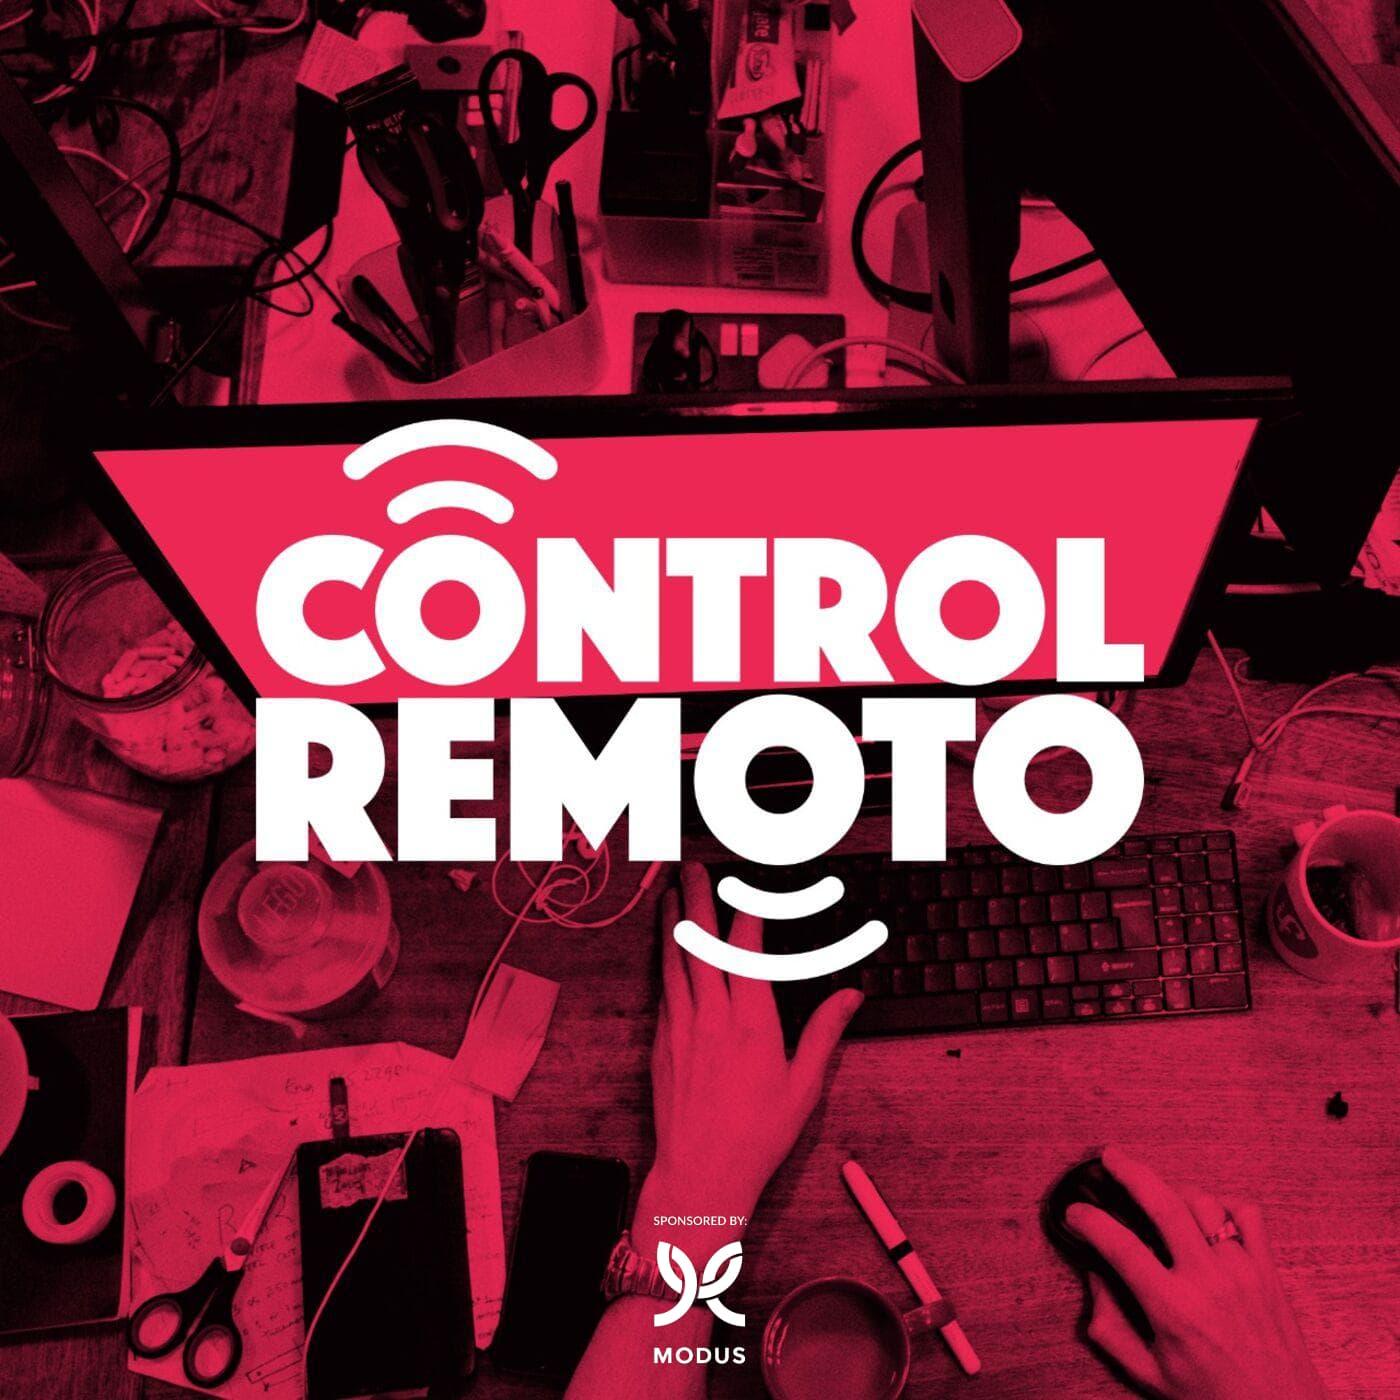 Control Remoto